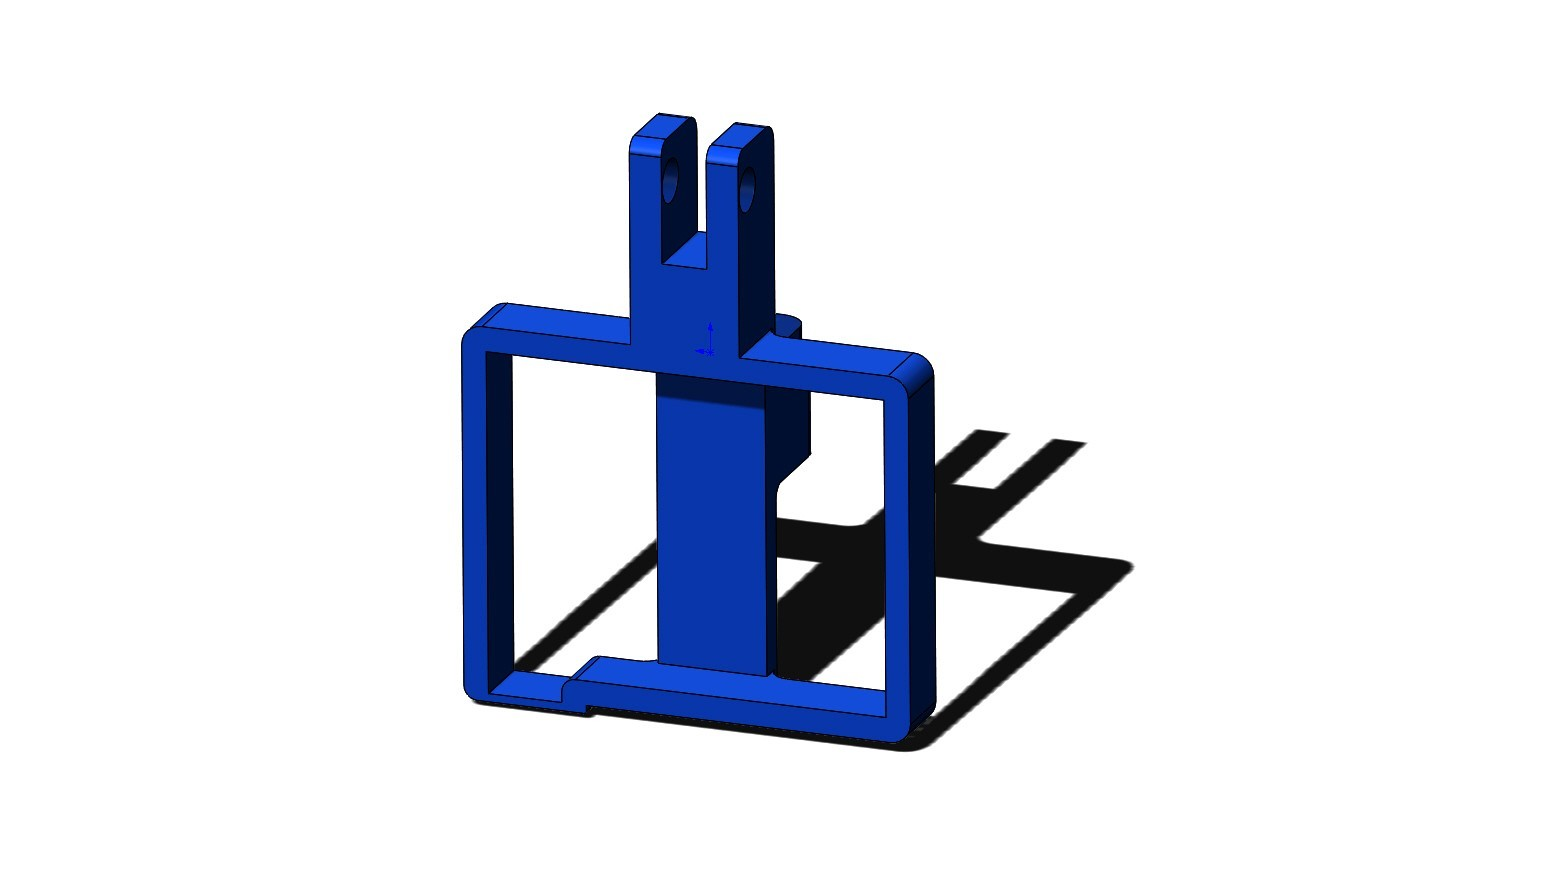 CC_Dial Holder Master-02-4.JPG Download free STL file CR-10 Dial Indicator Mount • 3D printer model, Trikonics